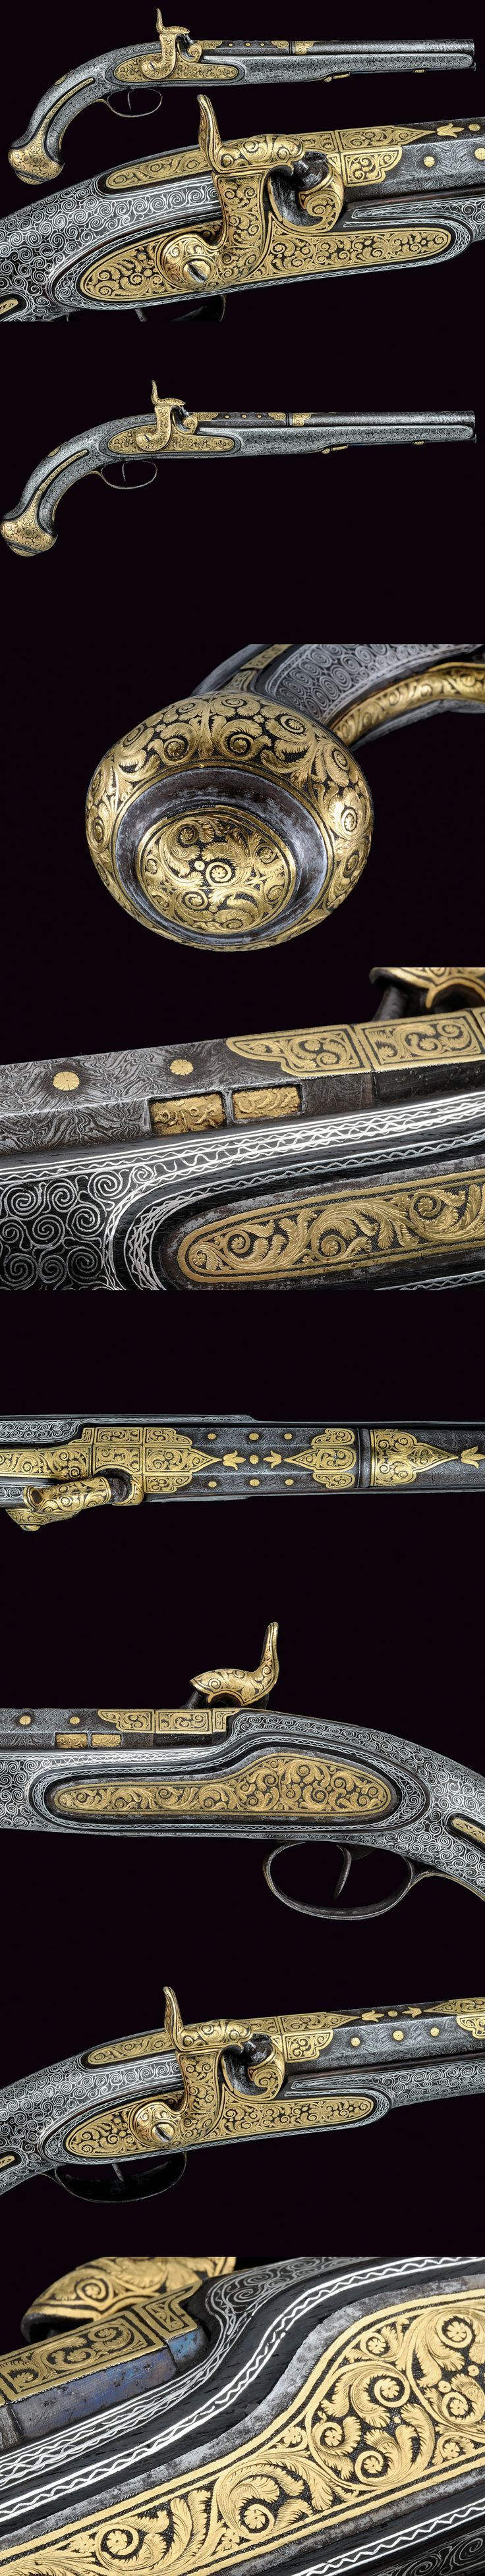 80 raras, lujosas e impresionantes armas de fuego - Parte 2 - Taringa!